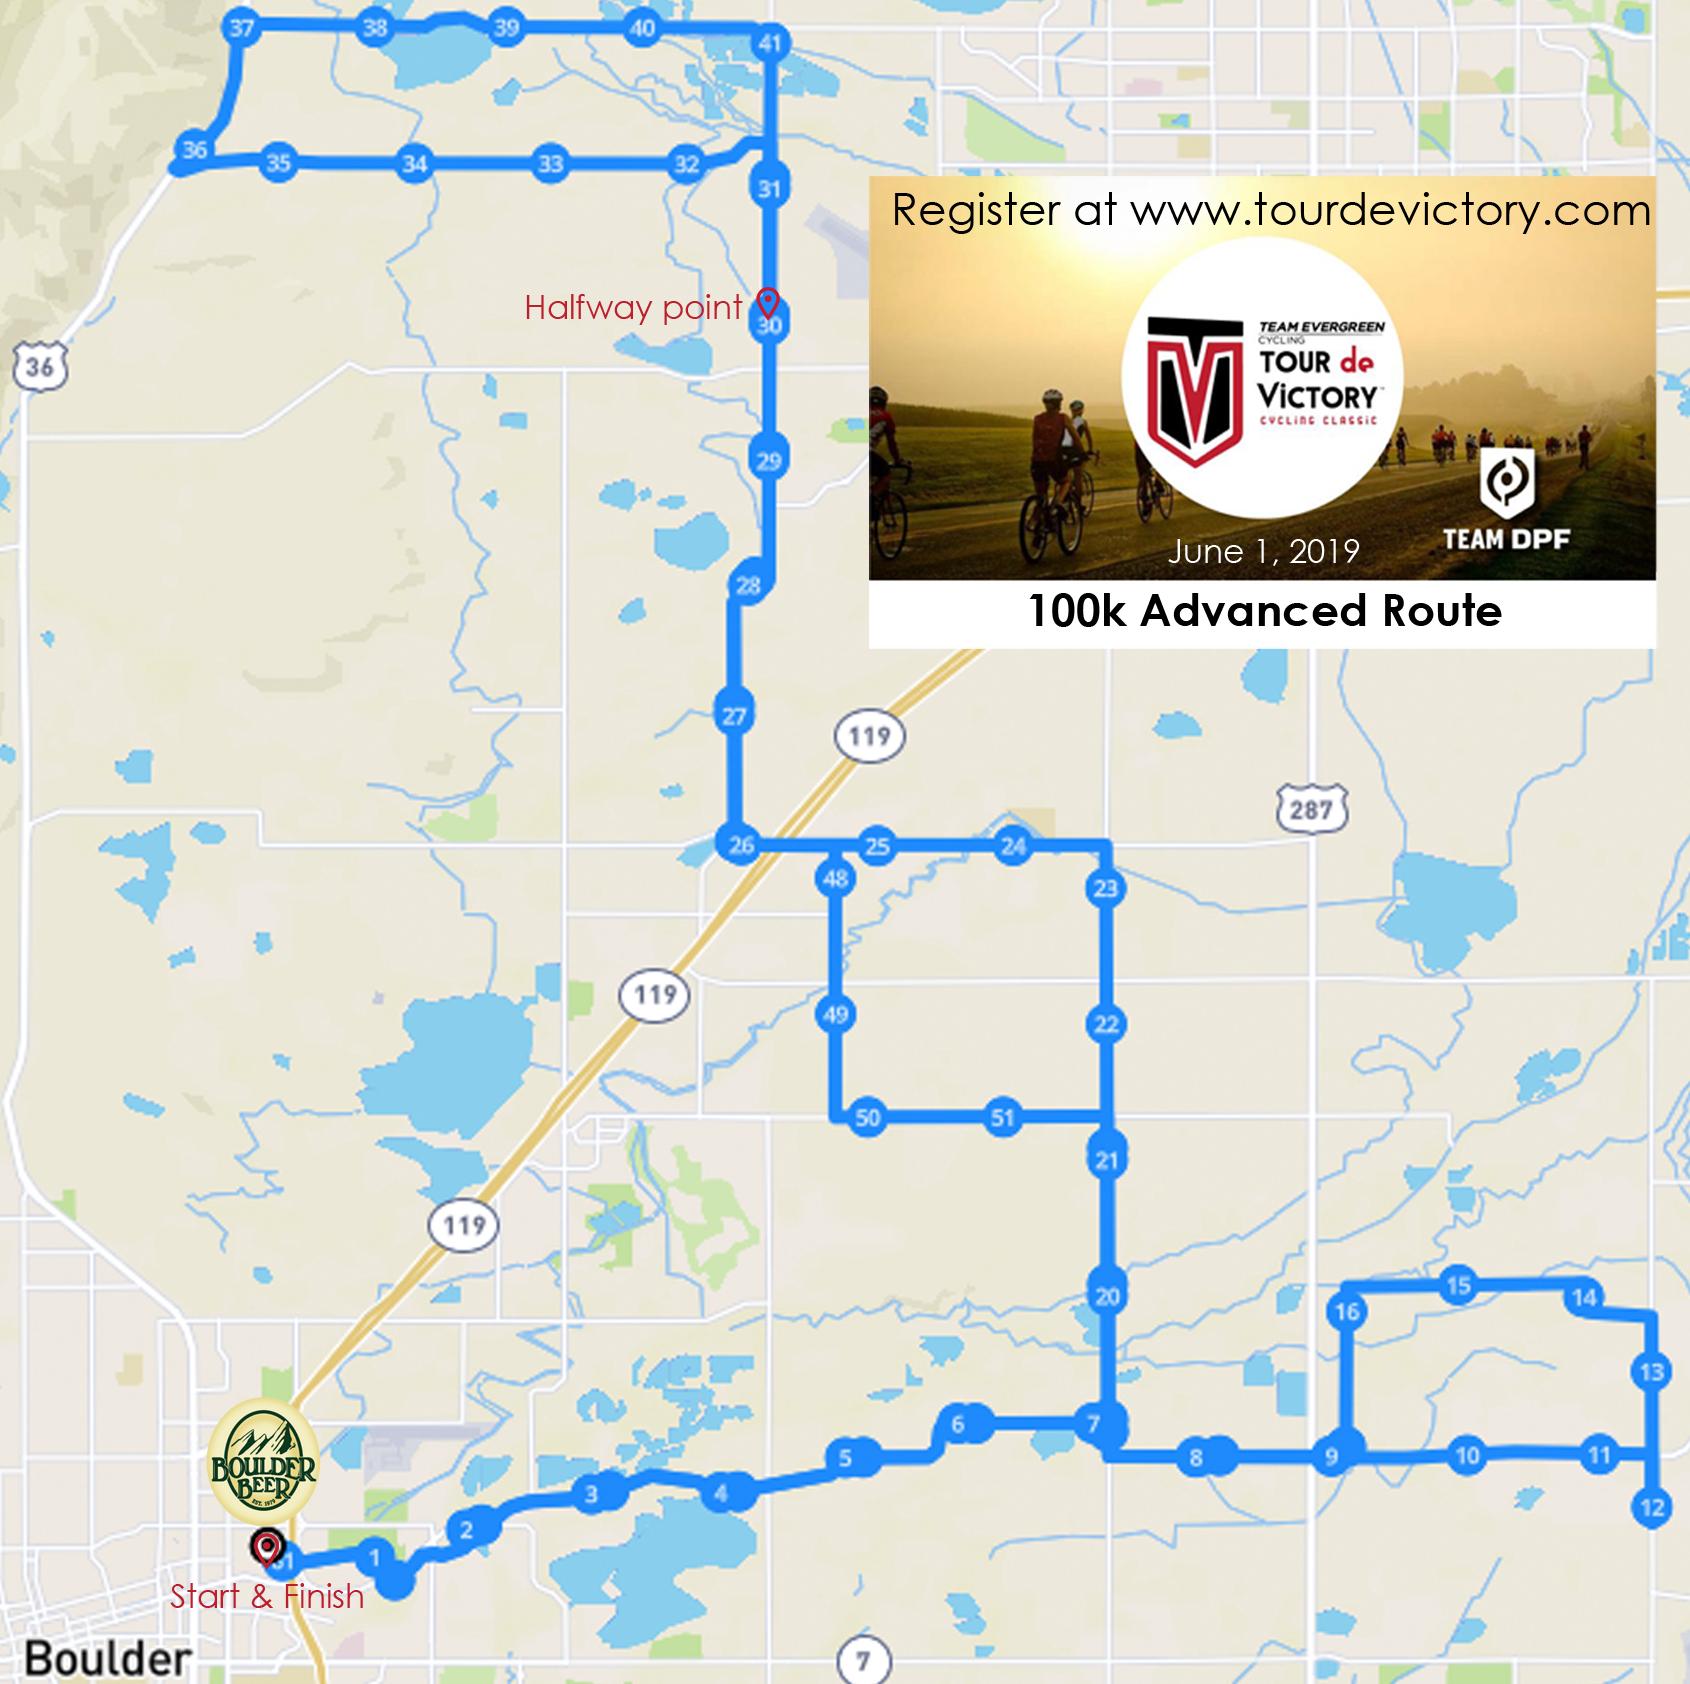 100k Advanced Route